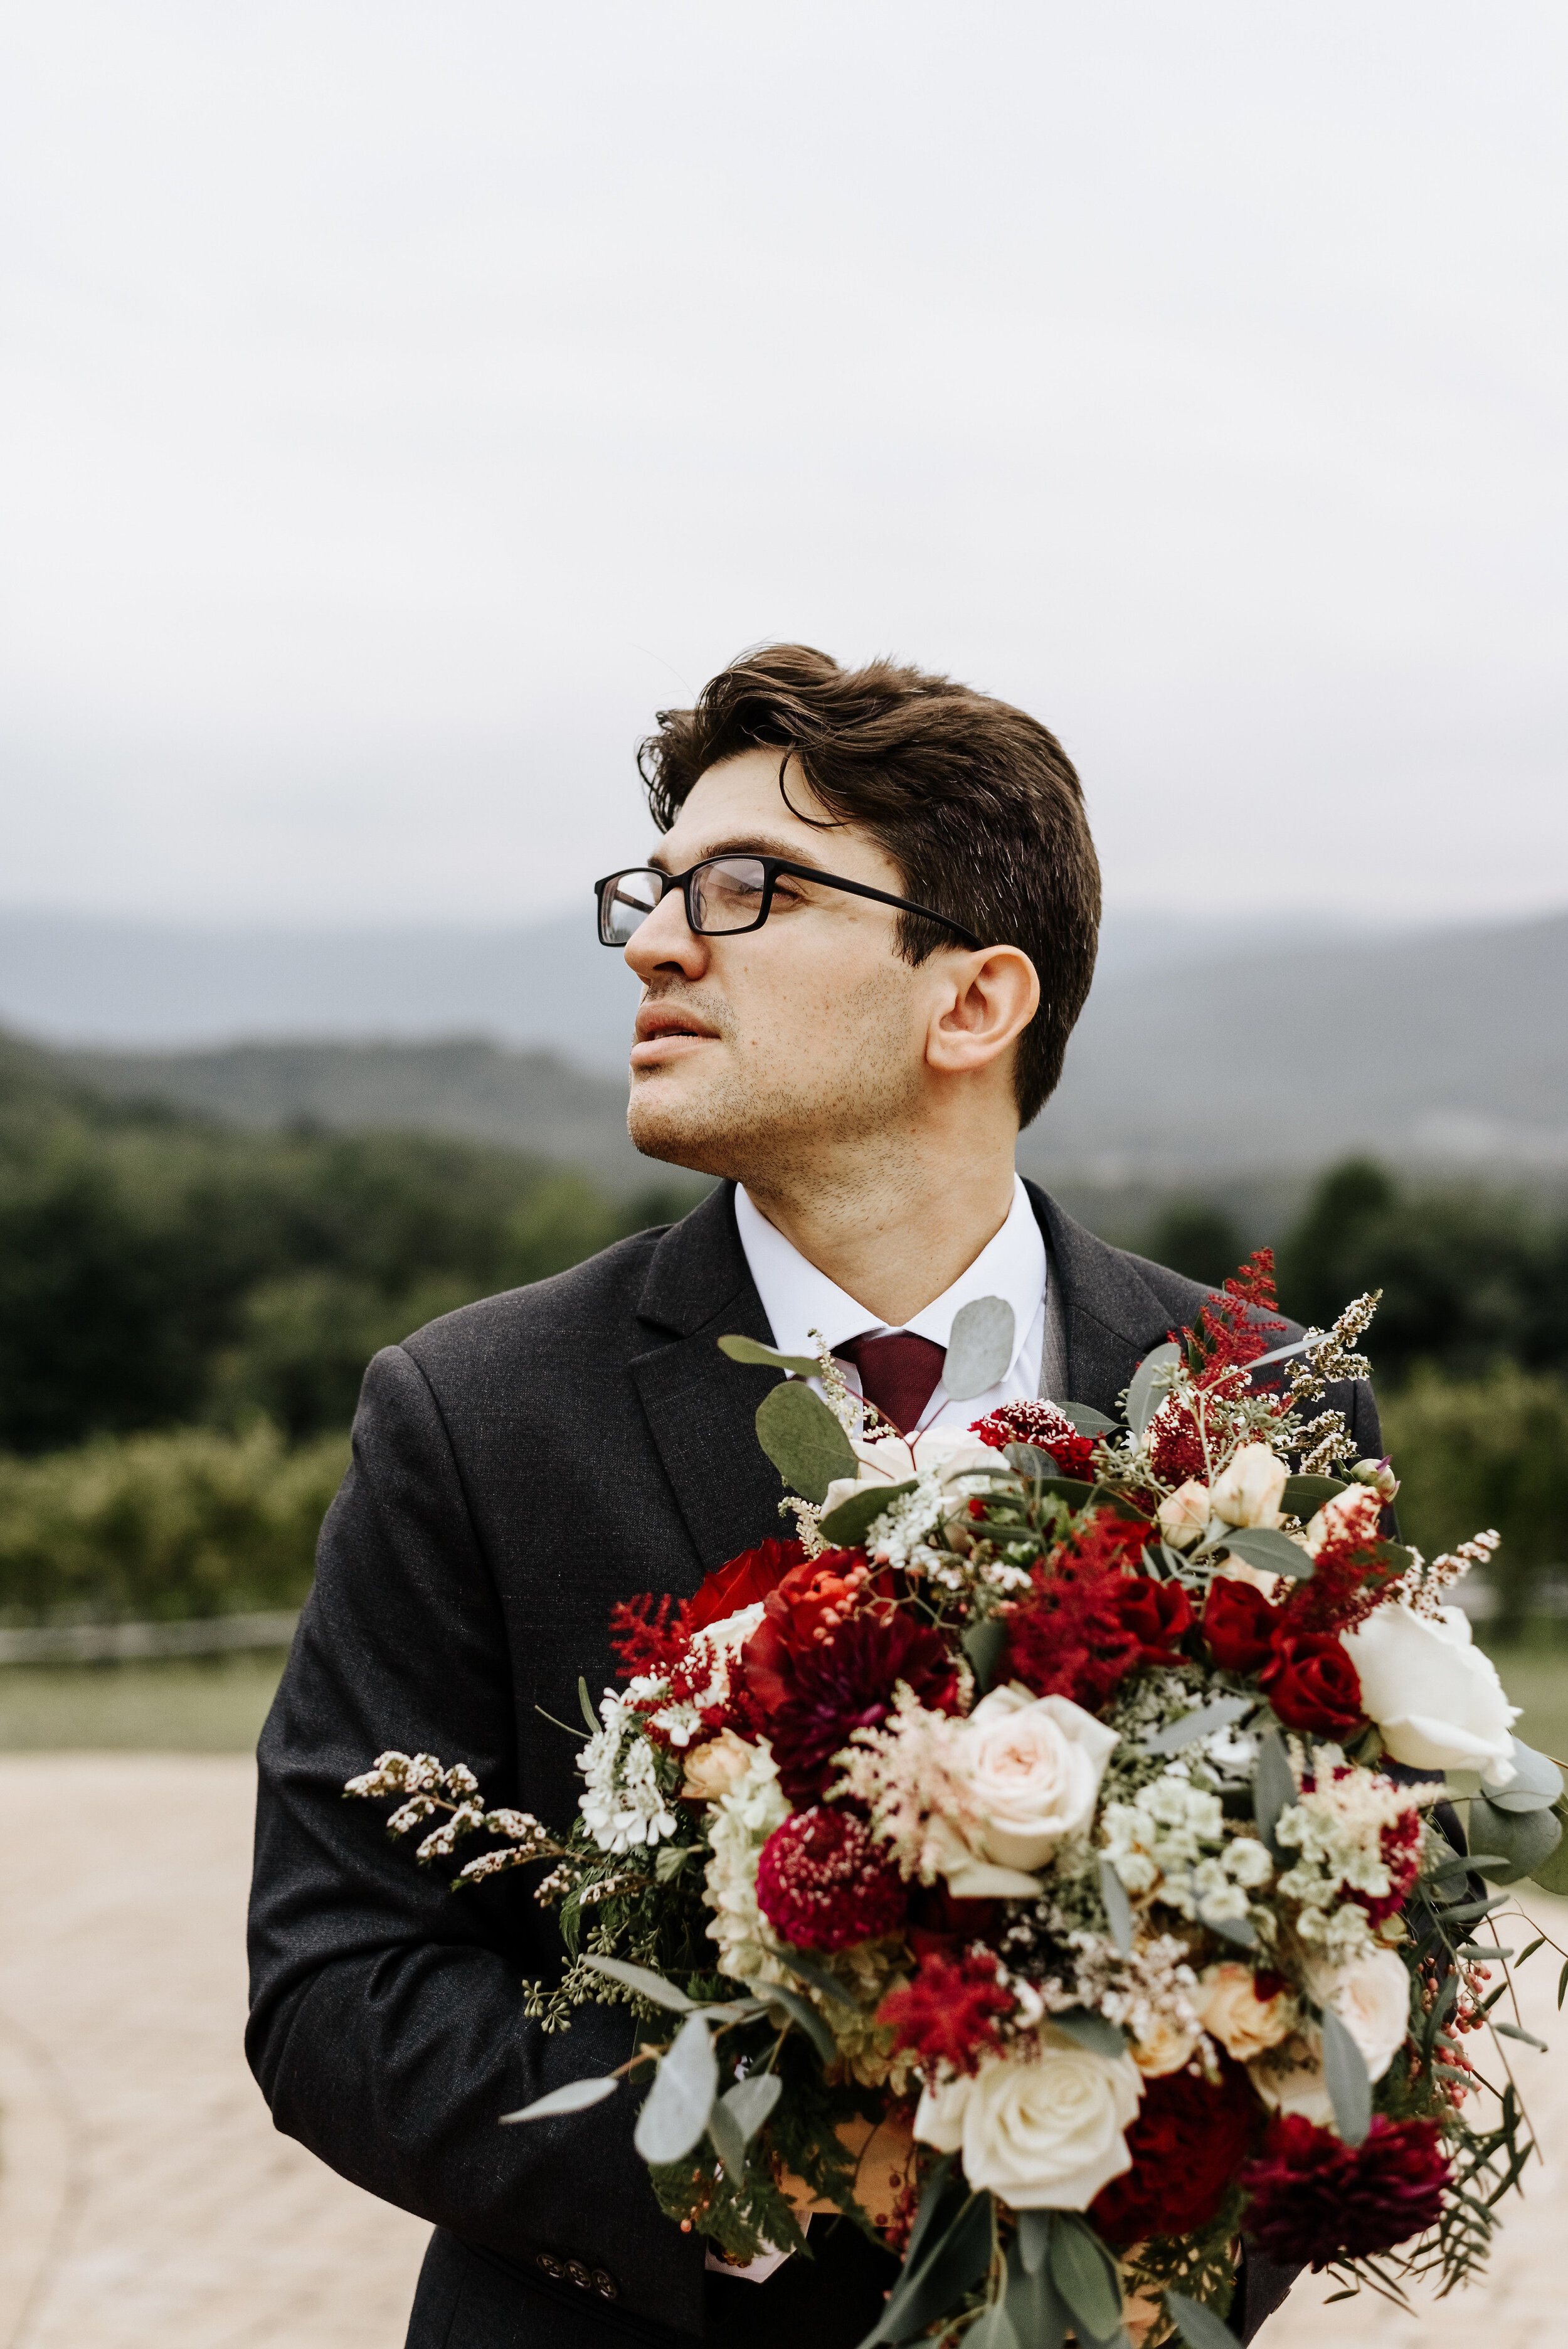 Allison_Nolan_Moss_Vineyards_Wedding_Charlottesville_Virginia_Photography_by_V_56.jpg